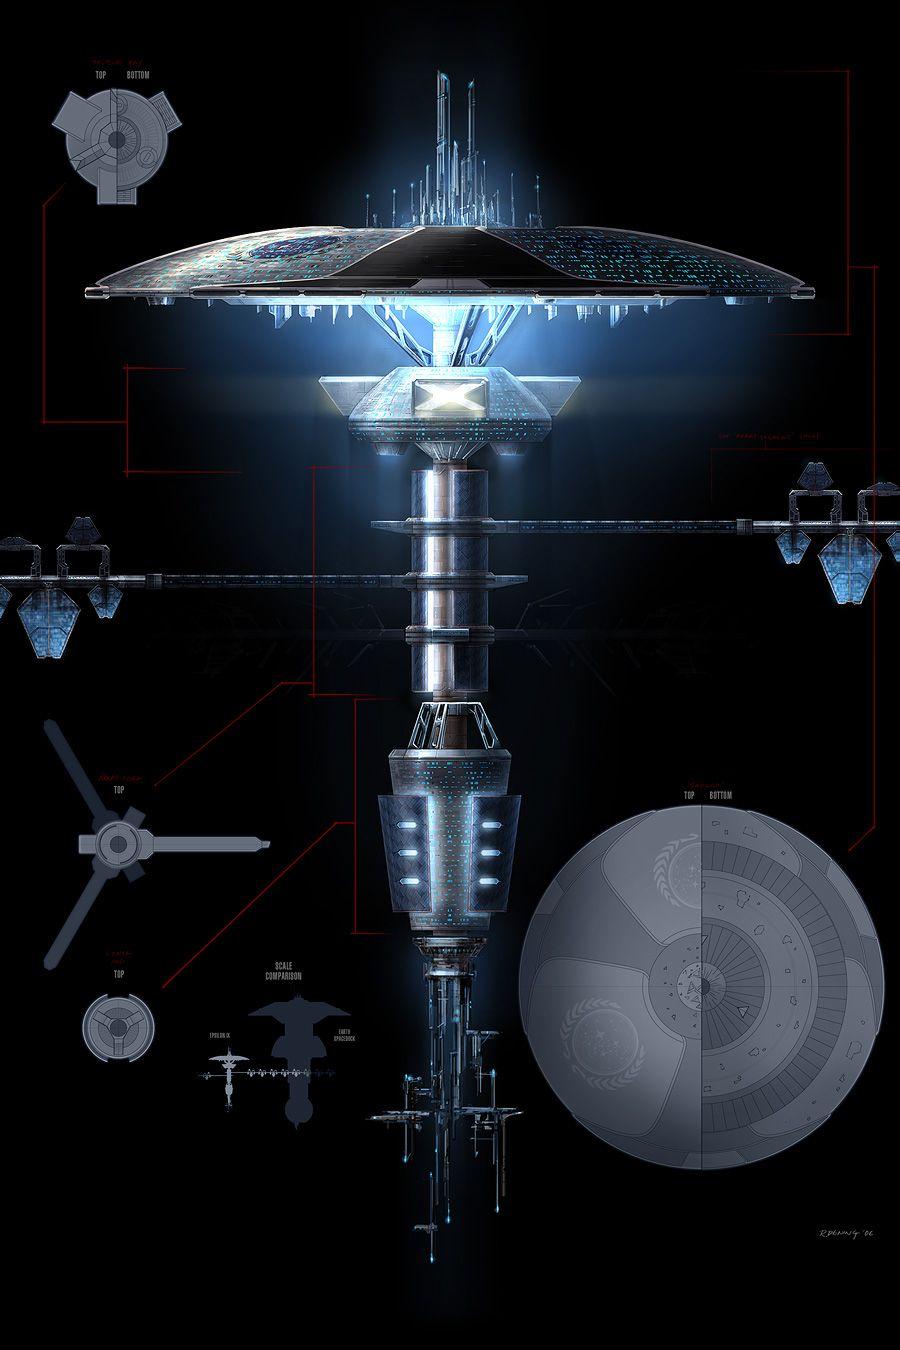 Colossalsized space station Starbase Orbital starship